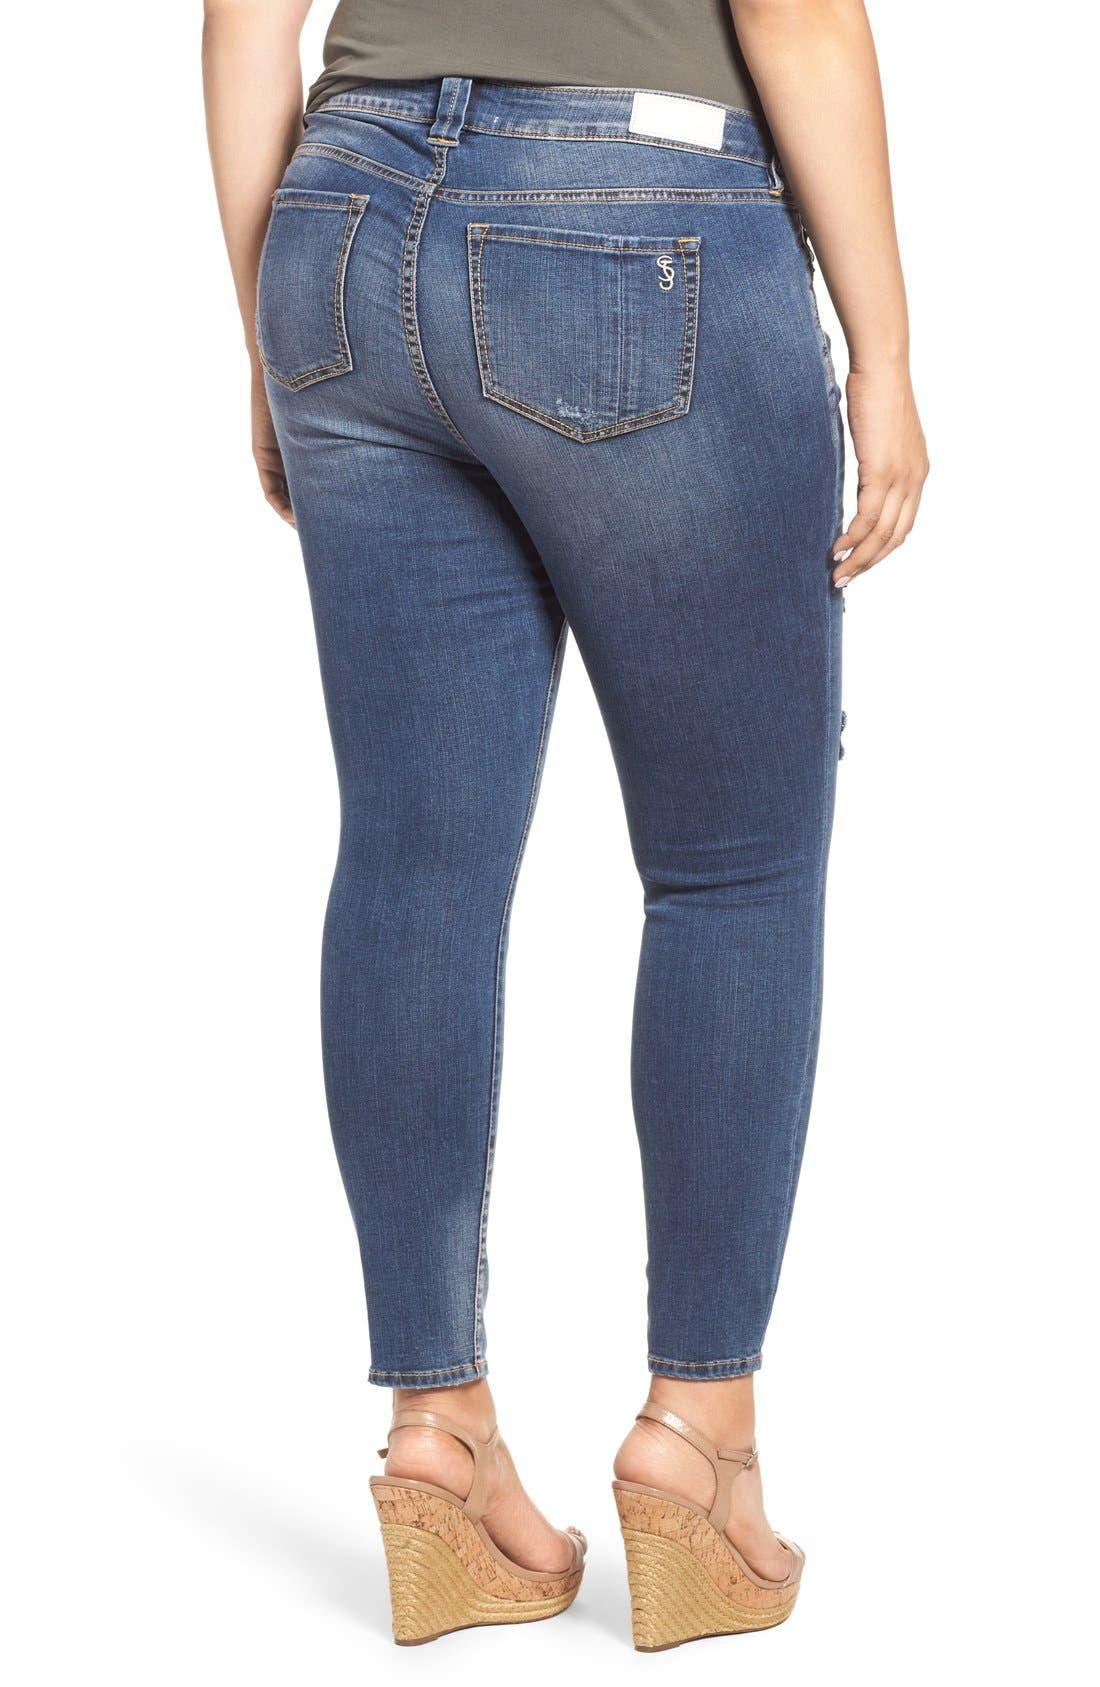 Alternate Image 3  - SLINK Jeans Ripped Stretch Ankle Skinny Jeans (Danika) (Plus Size)